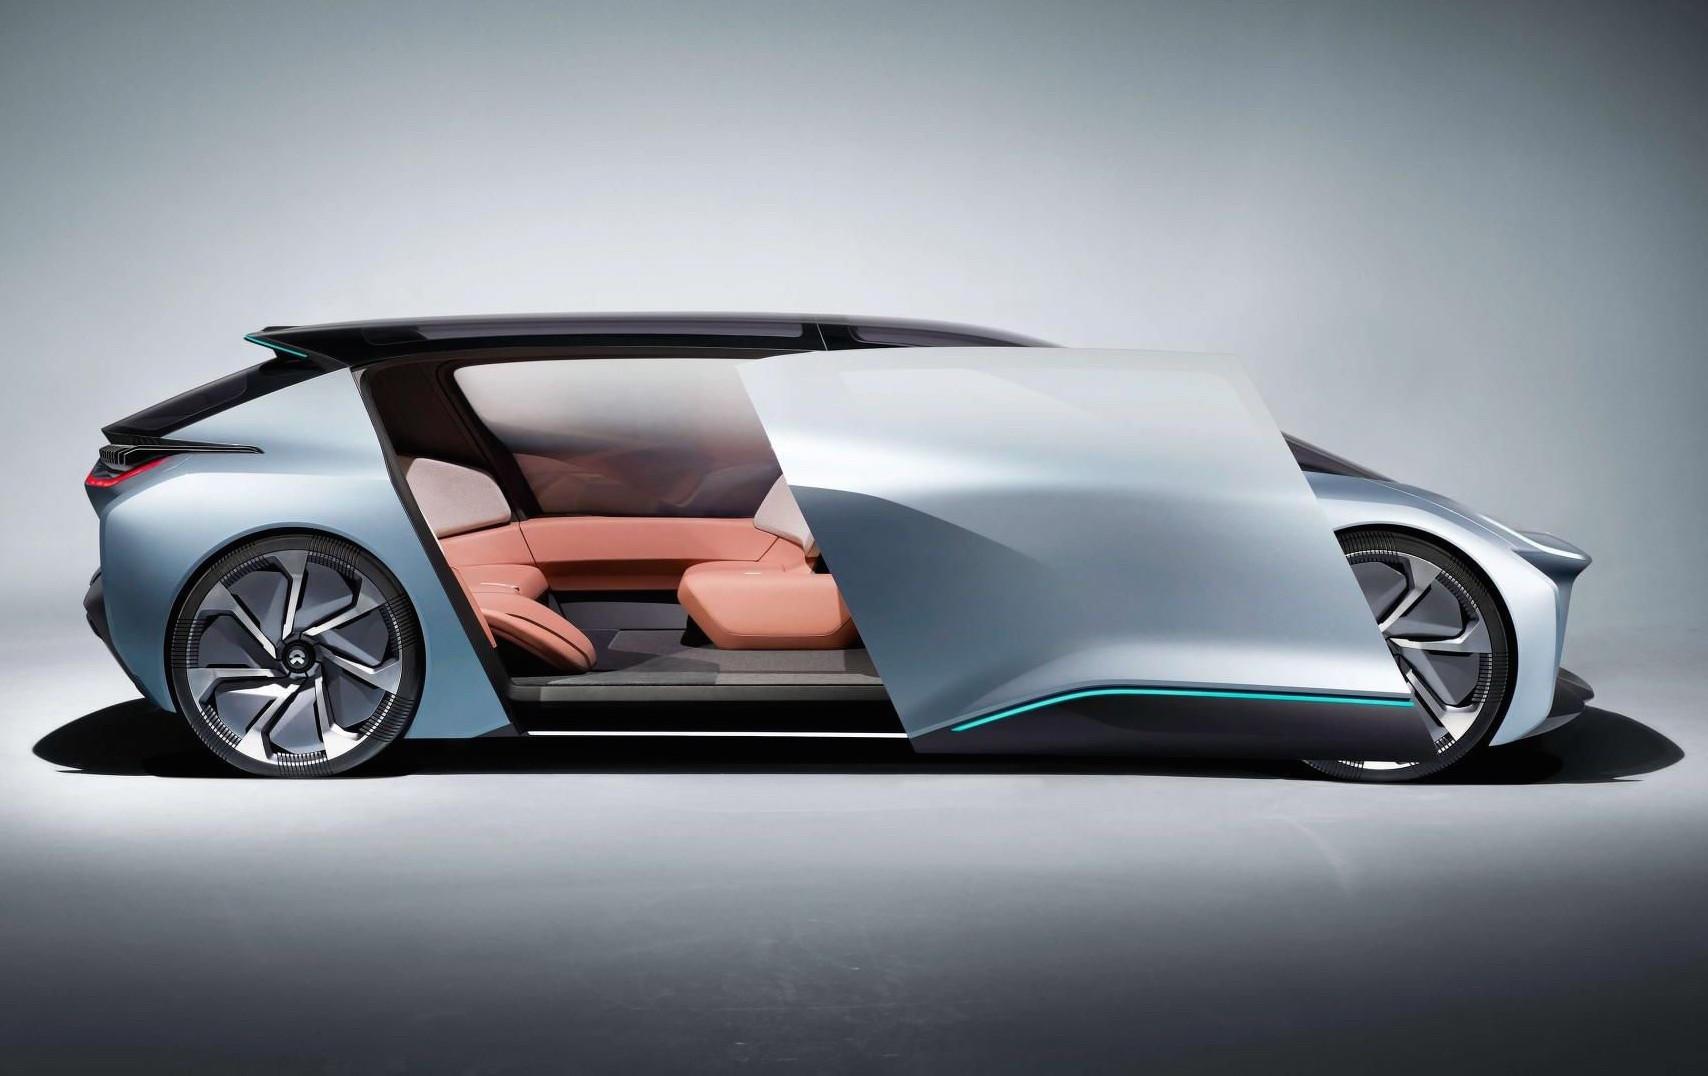 nio eve concept envisioned as autonomous vehicle for 2020. Black Bedroom Furniture Sets. Home Design Ideas